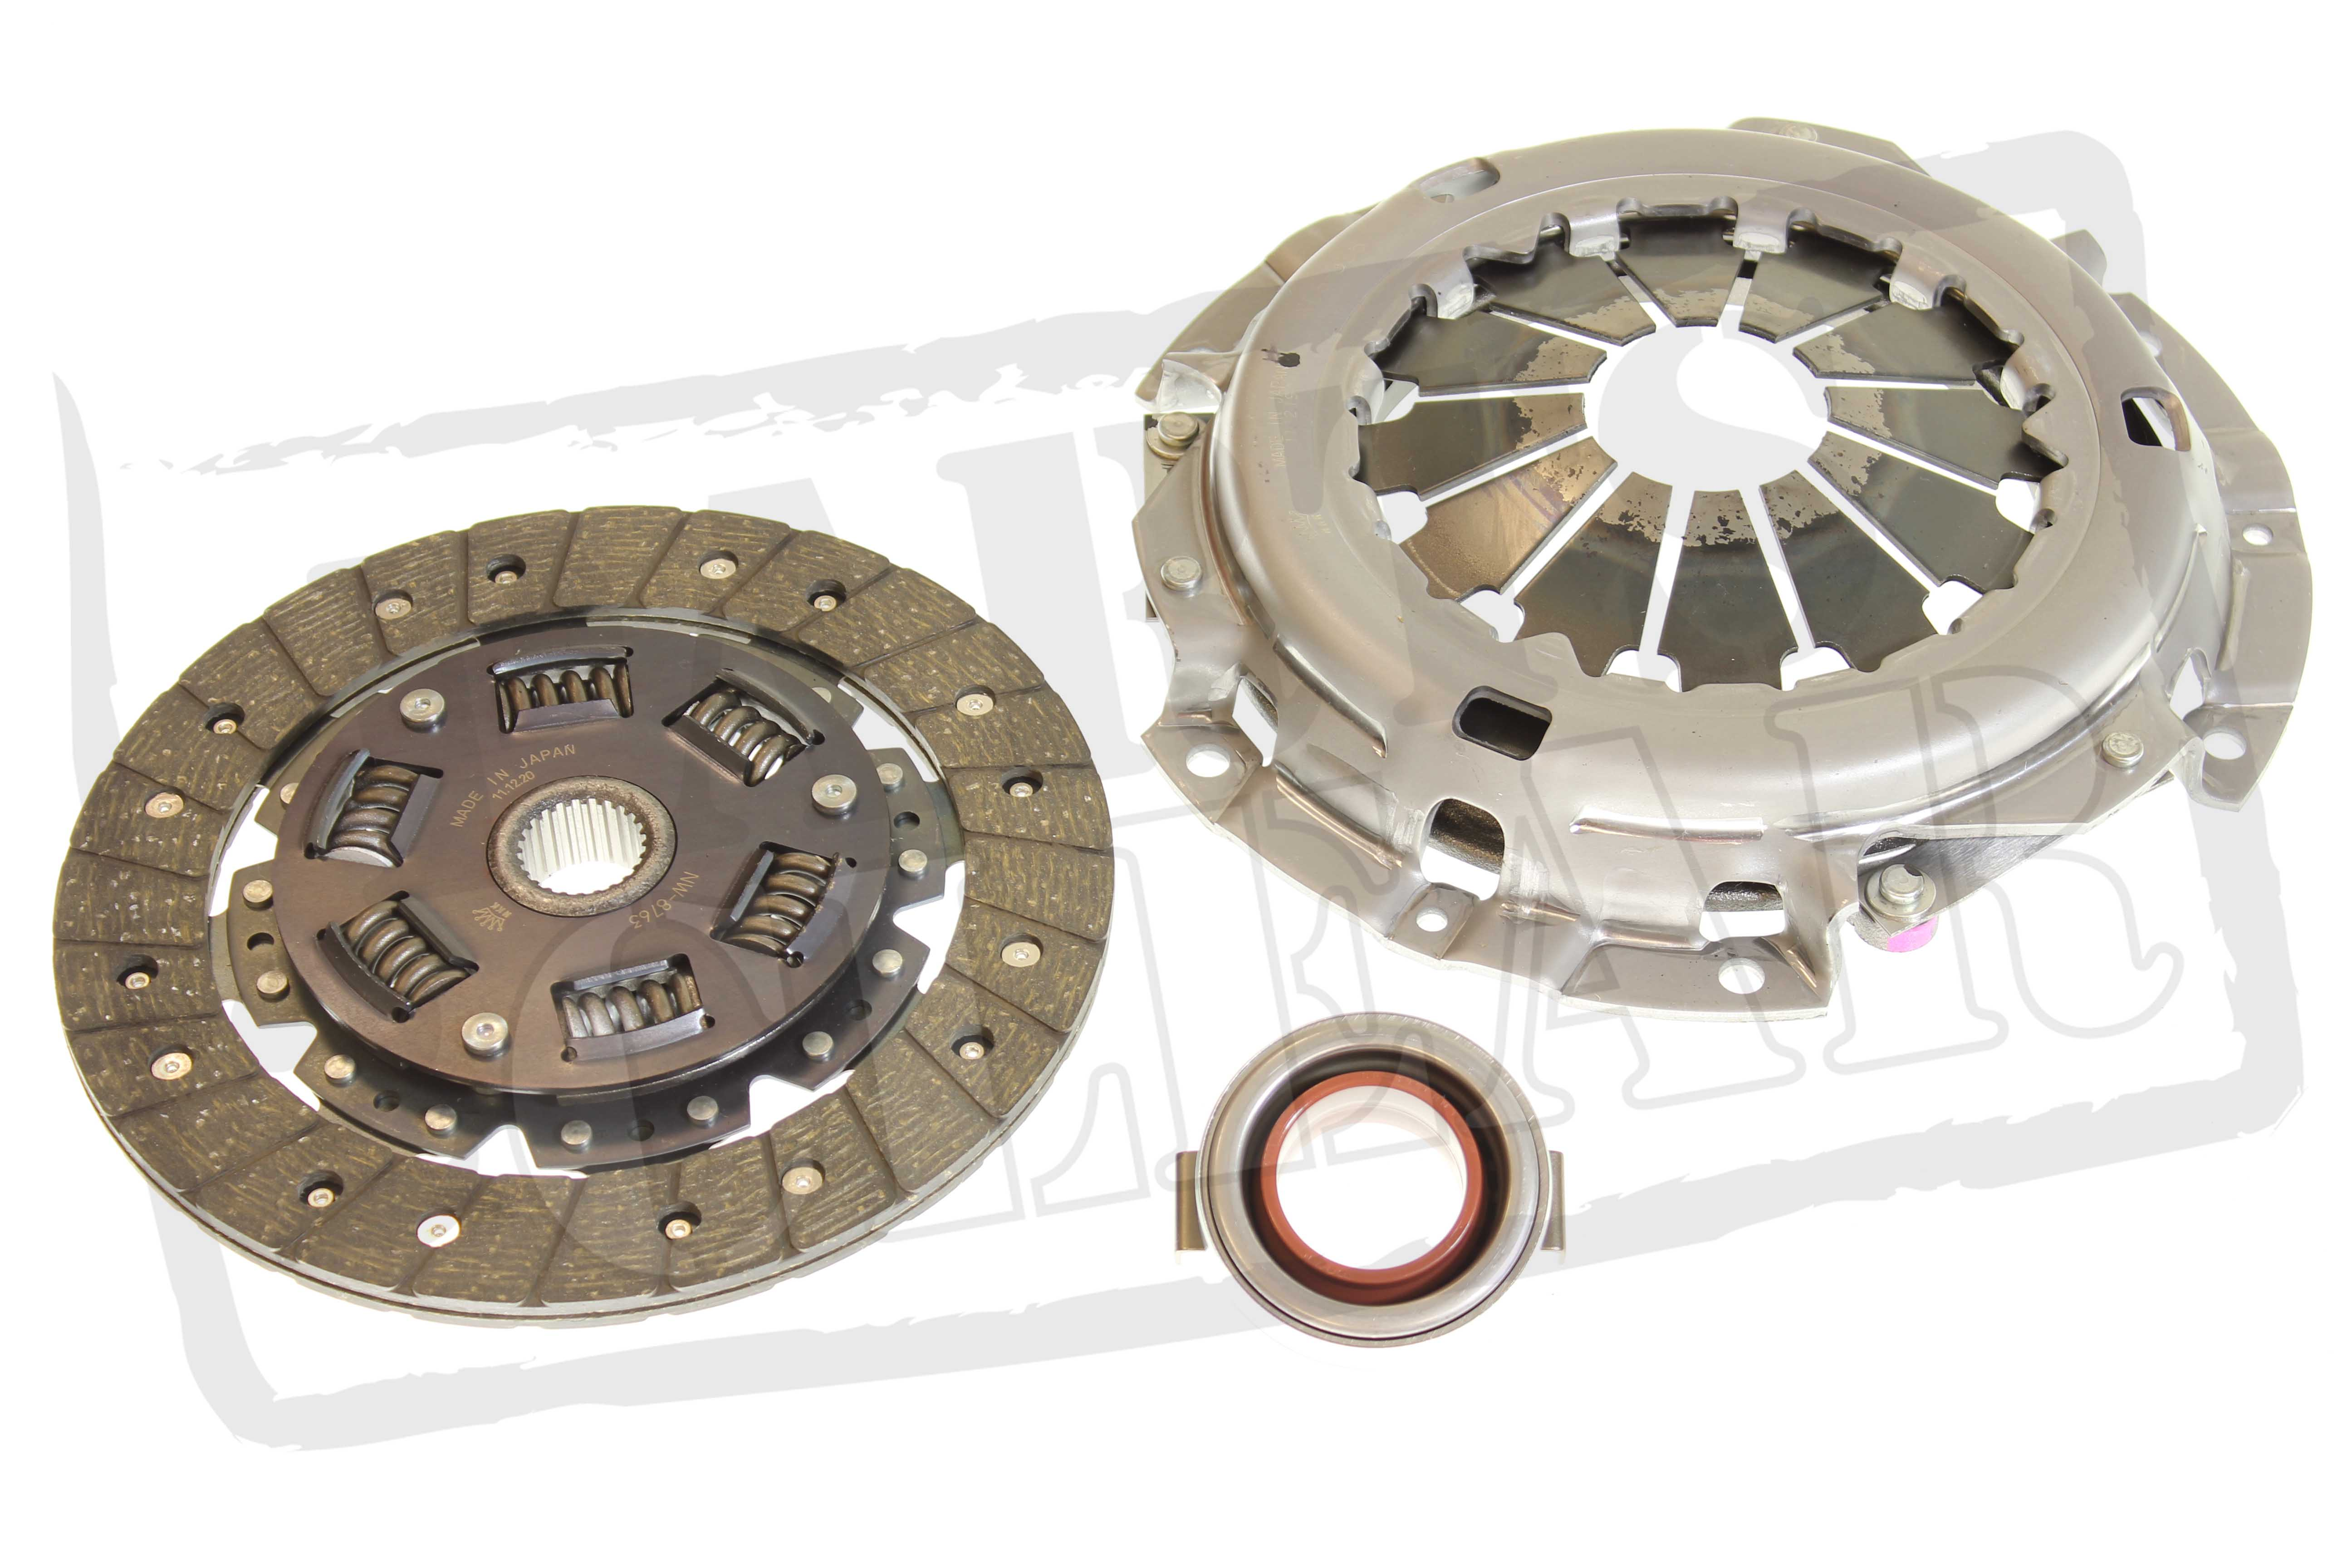 Honda civic type r 2 0 clutch kit replace set 3 part ep3 for Clutch replacement cost honda civic